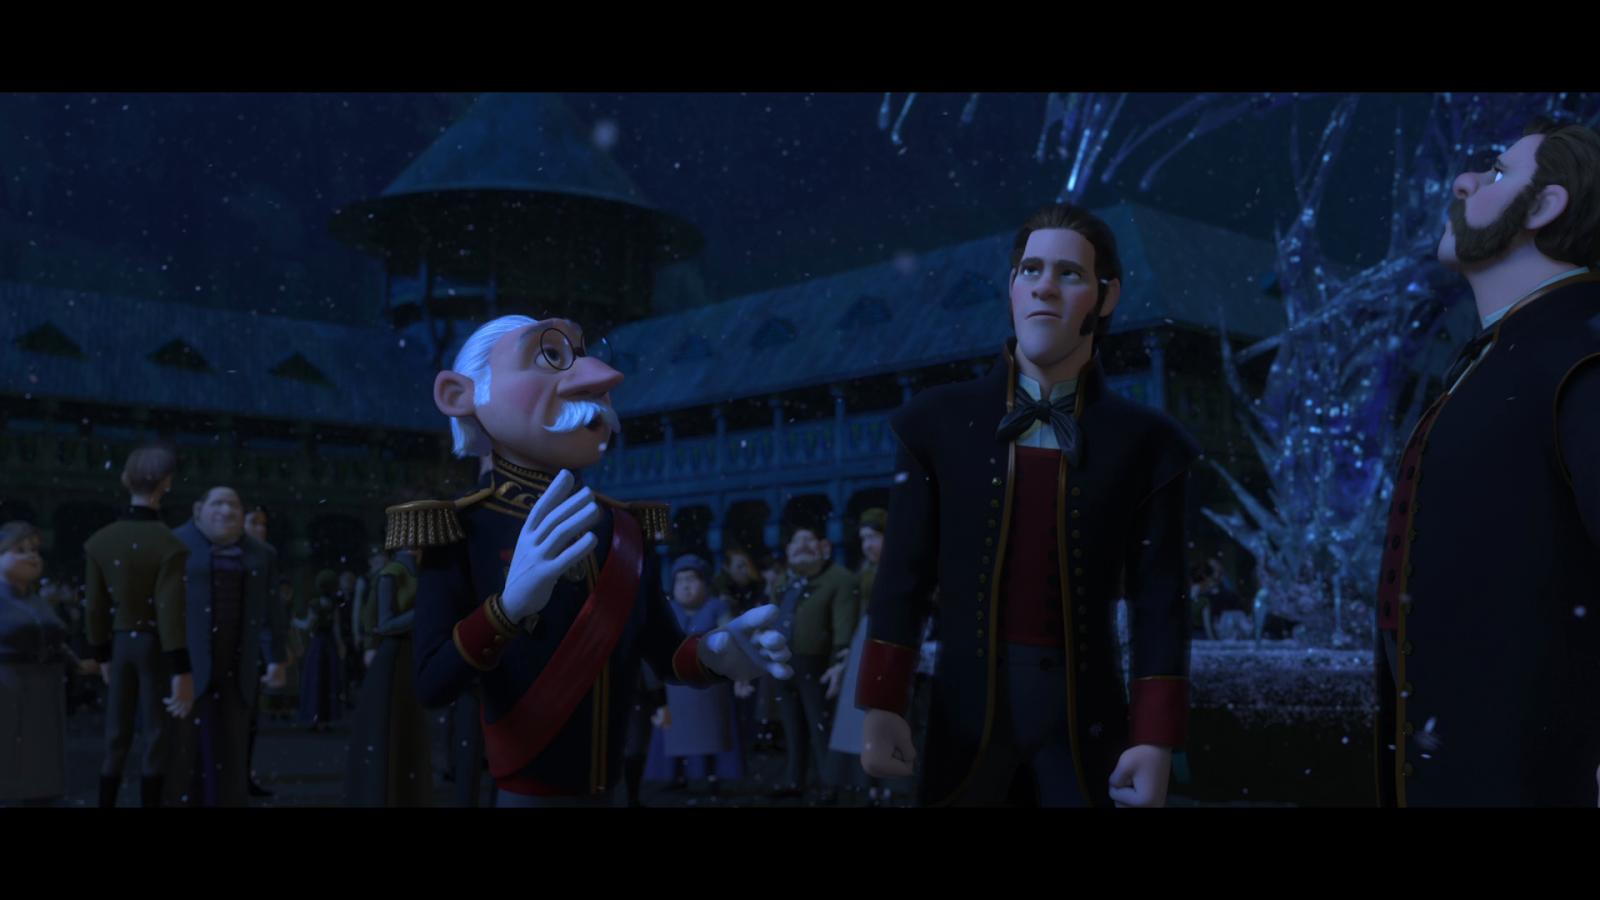 Frozen: Una Aventura Congelada (2013) BRRip 720p Latino-Castellano-Ingles captura 1